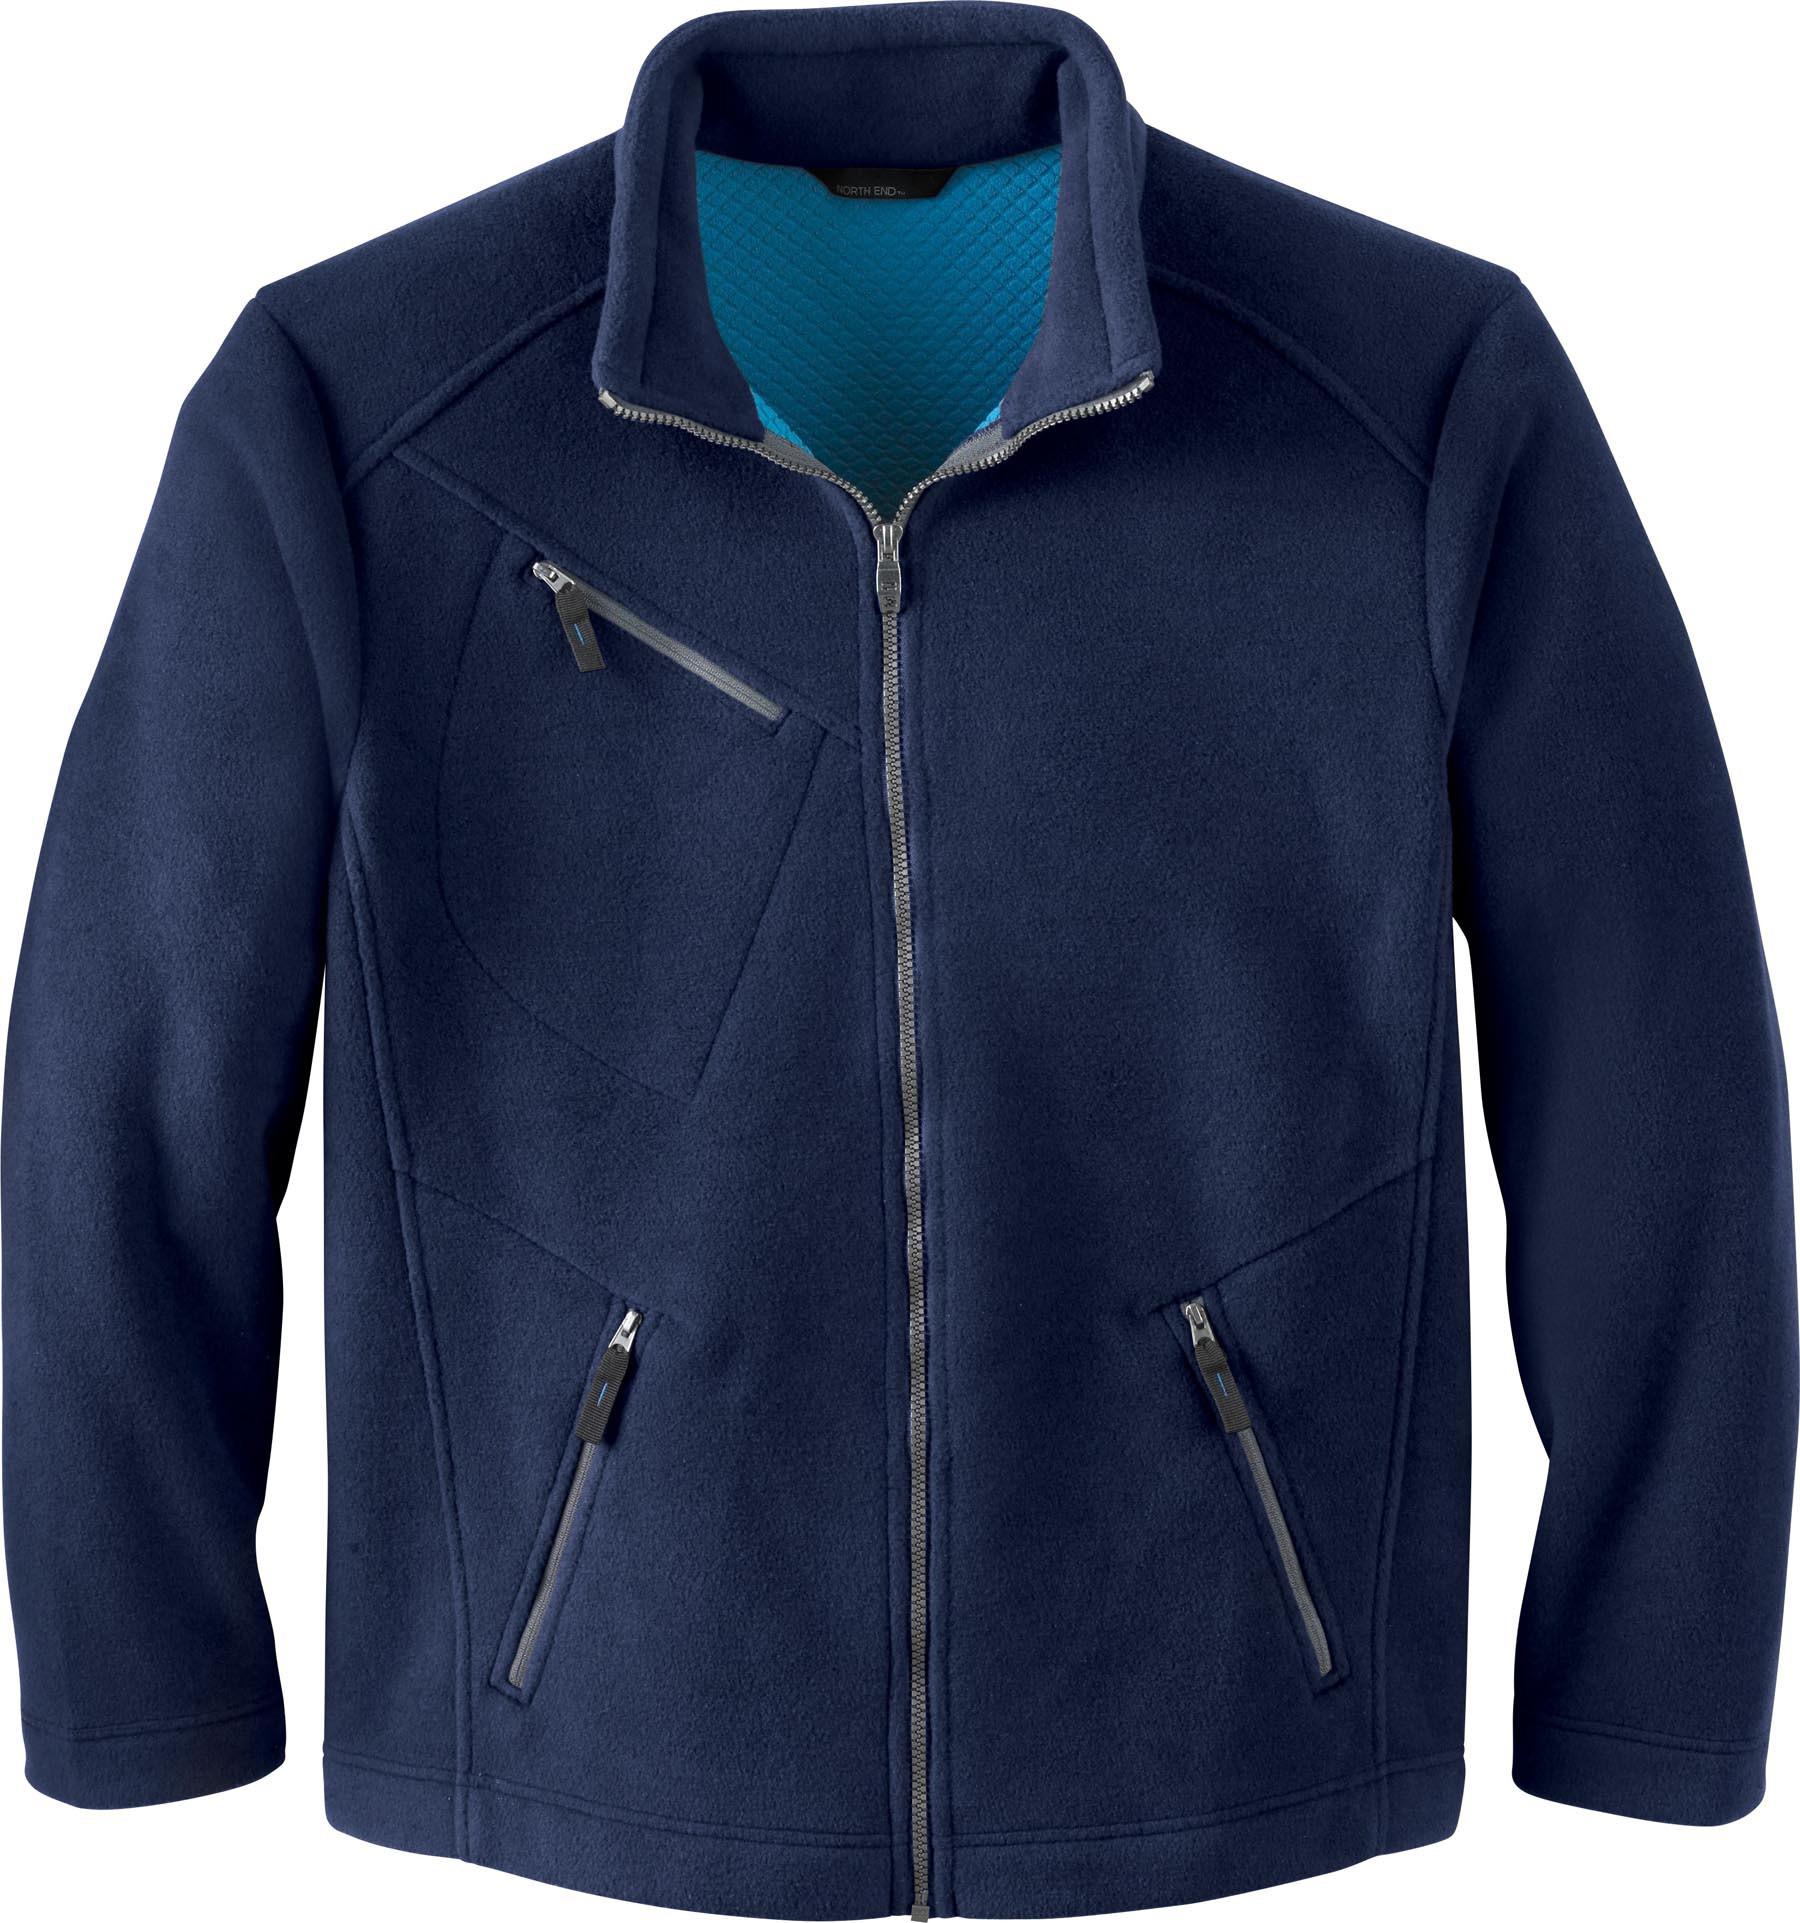 Ash City Bonded Fleece 88157 - Men's Bonded Jacqoard ...